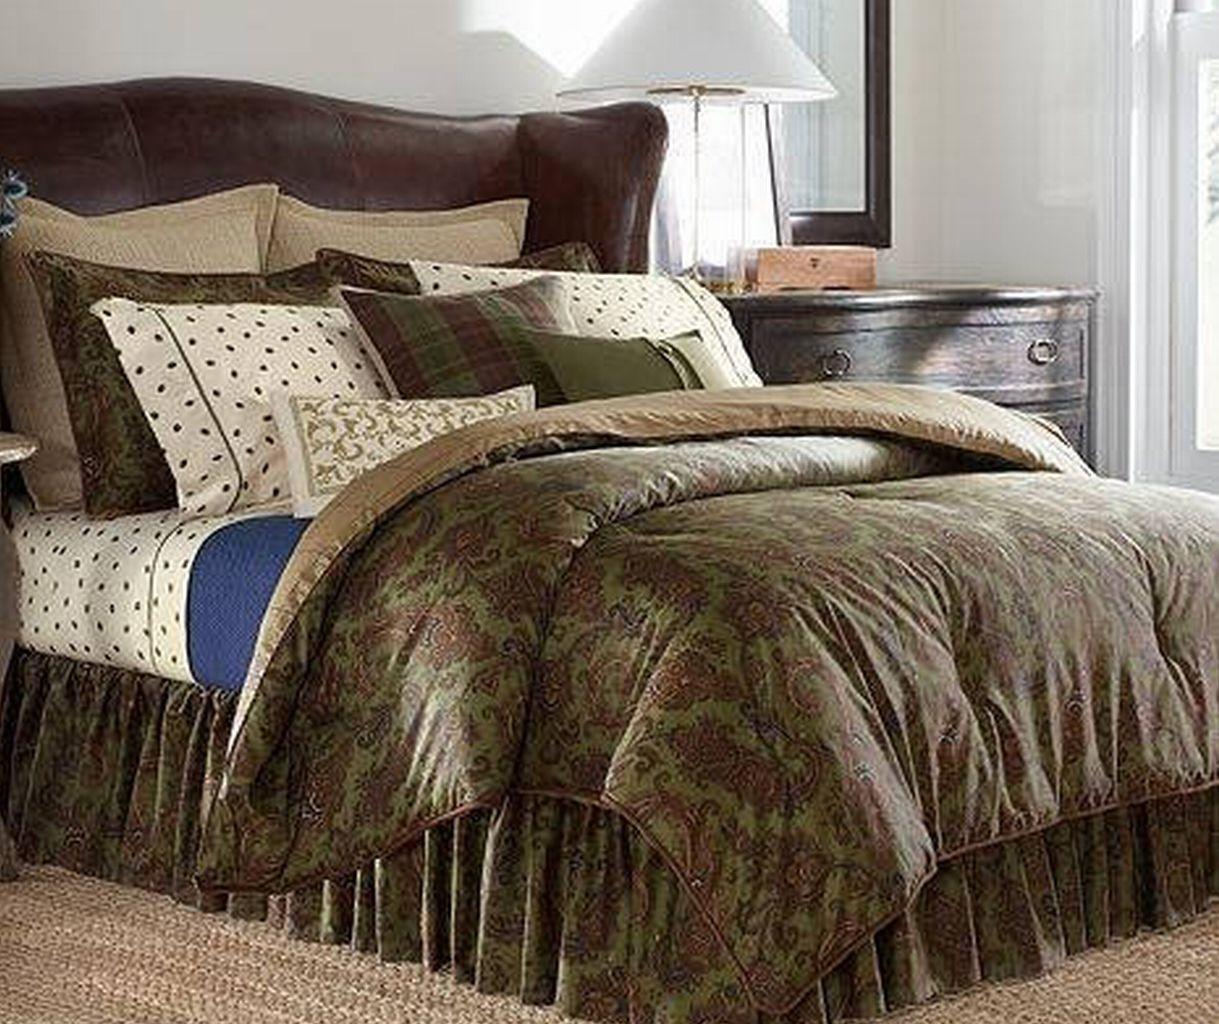 Ralph lauren plaid bedding - Chaps Ralph Lauren Beekman Place Green Paisley Plaid Queen Comforter Set 247 49